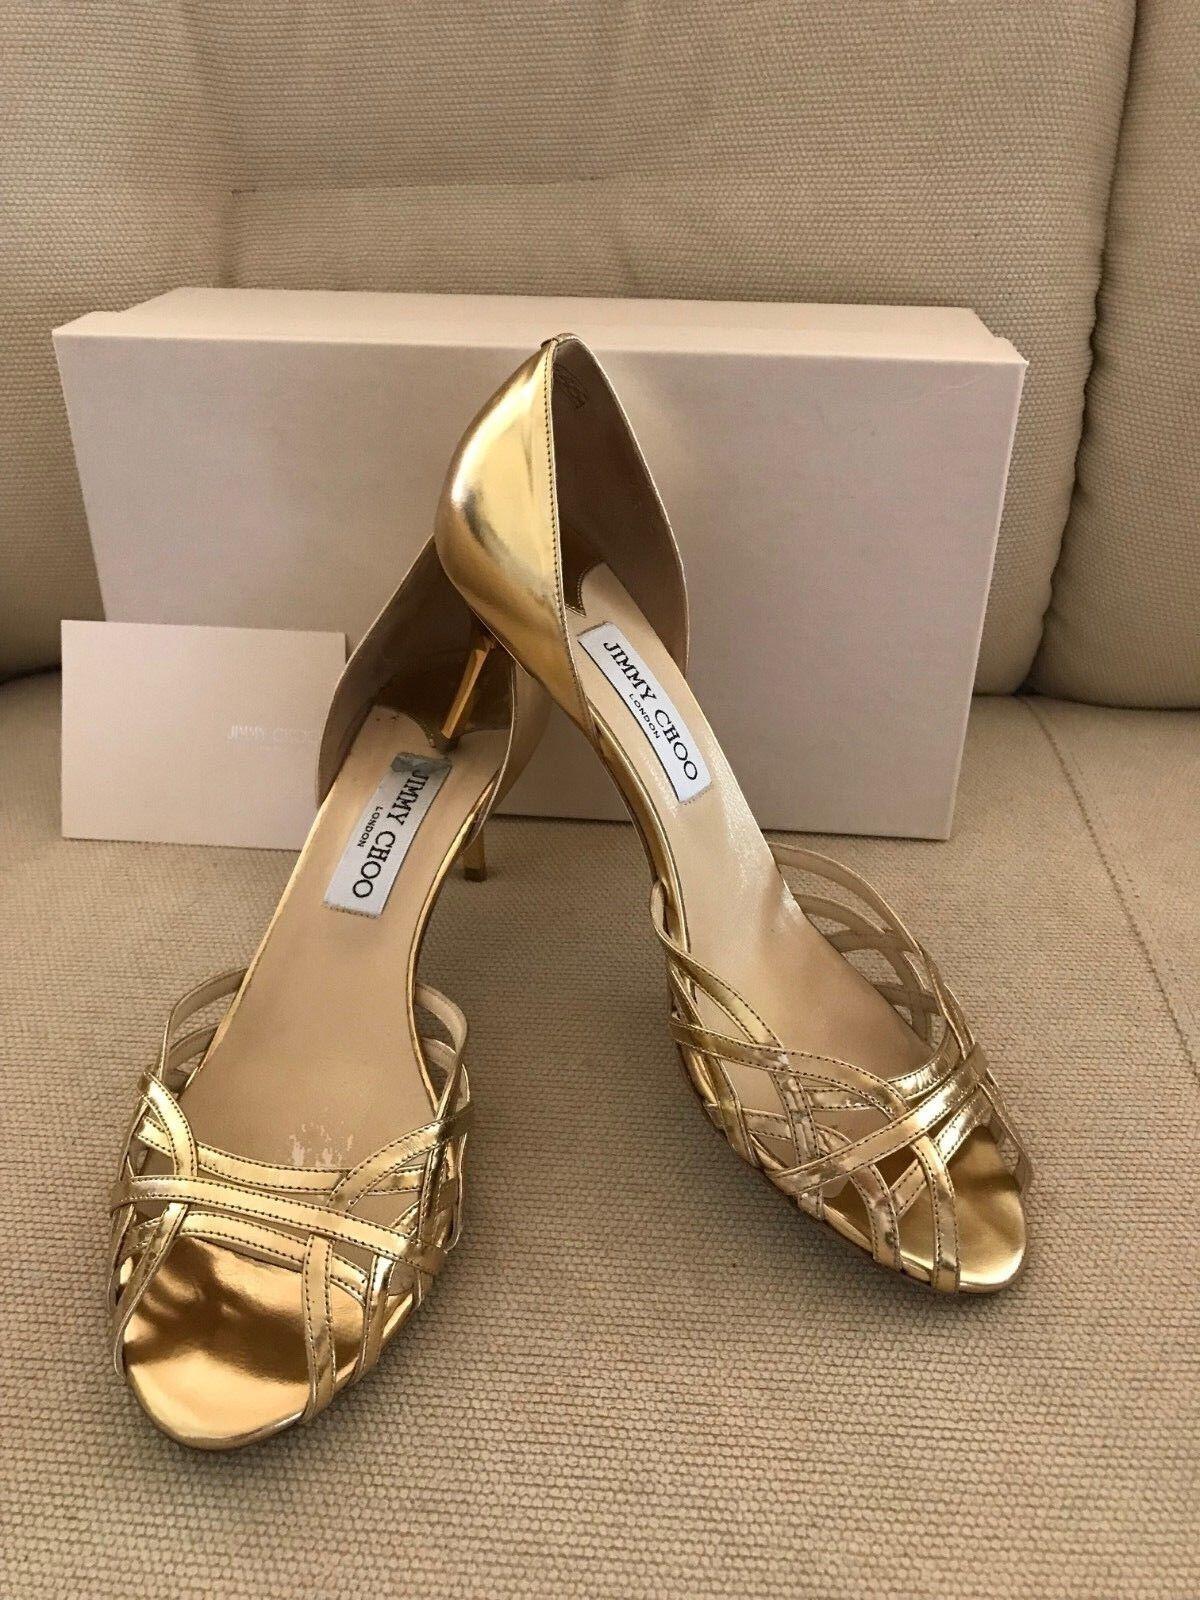 600 Jimmy zapatos Choo Metallic Leather oro-Tone zapatos Jimmy Heels Sandals Dandy Dorsay 39 9 69c1bf